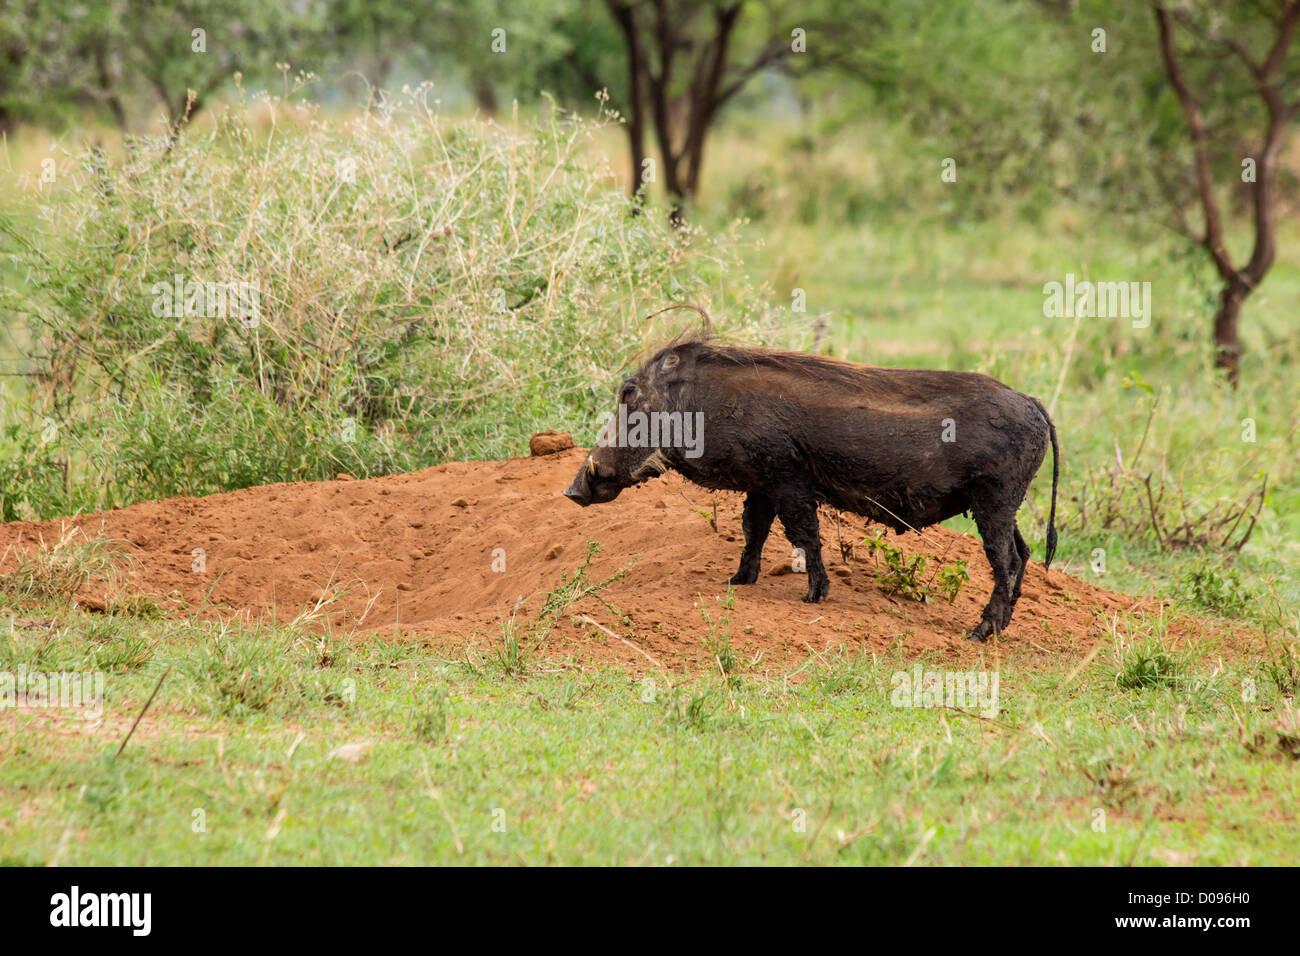 Warthog with piglets, Tarangire National Park, Tanzania, Africa - Stock Image